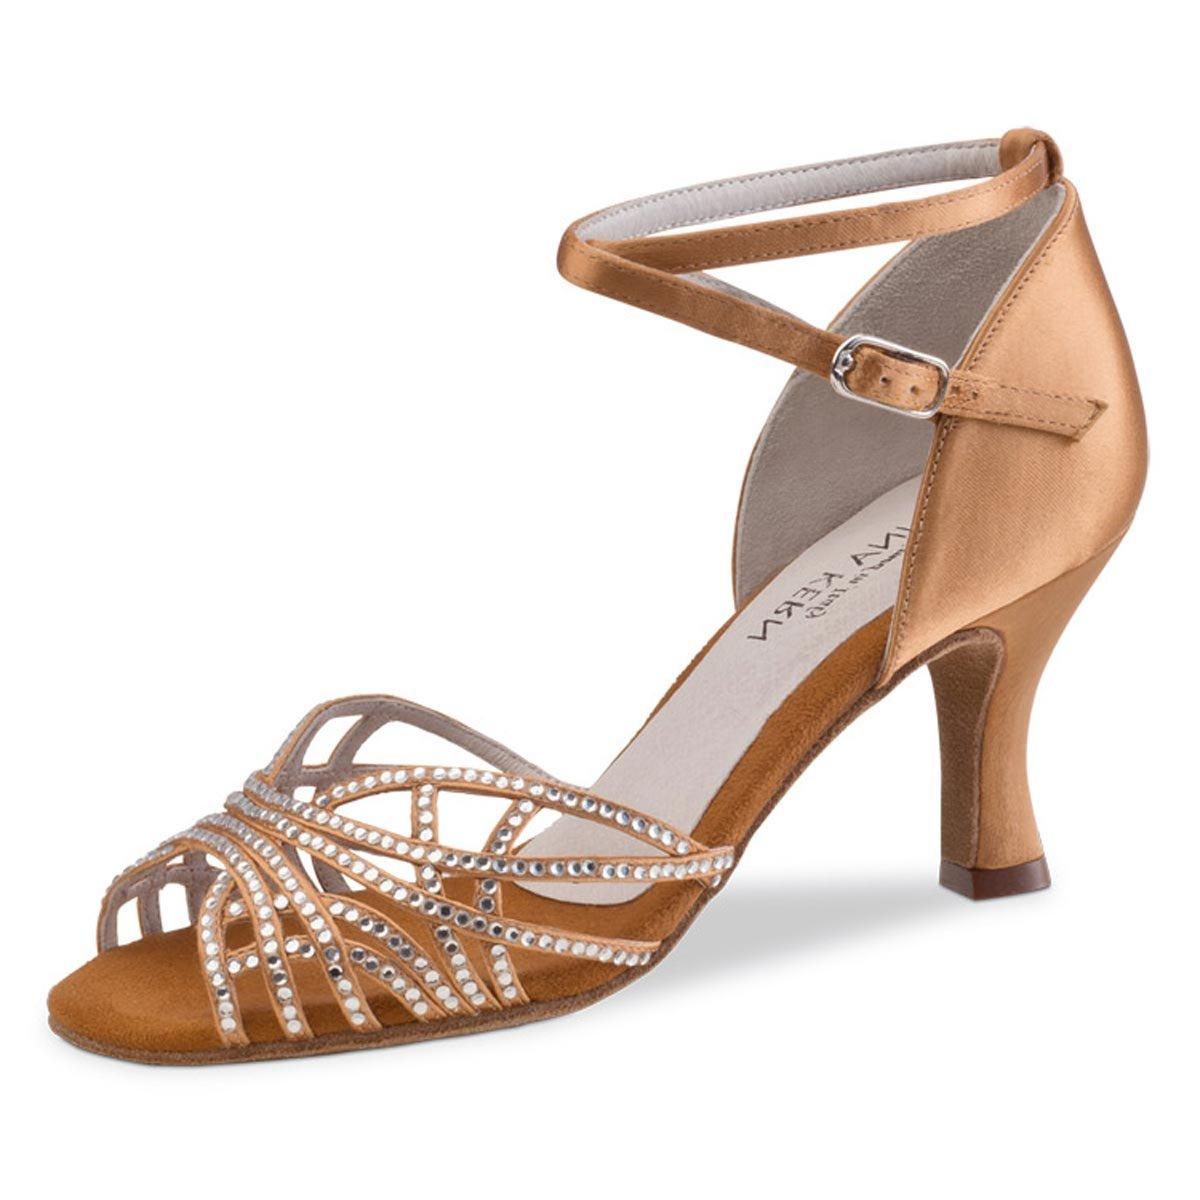 Normalweite Satin Bronze 6 cm Flare Absatz Anna Kern Damen Tanzschuhe 700-60